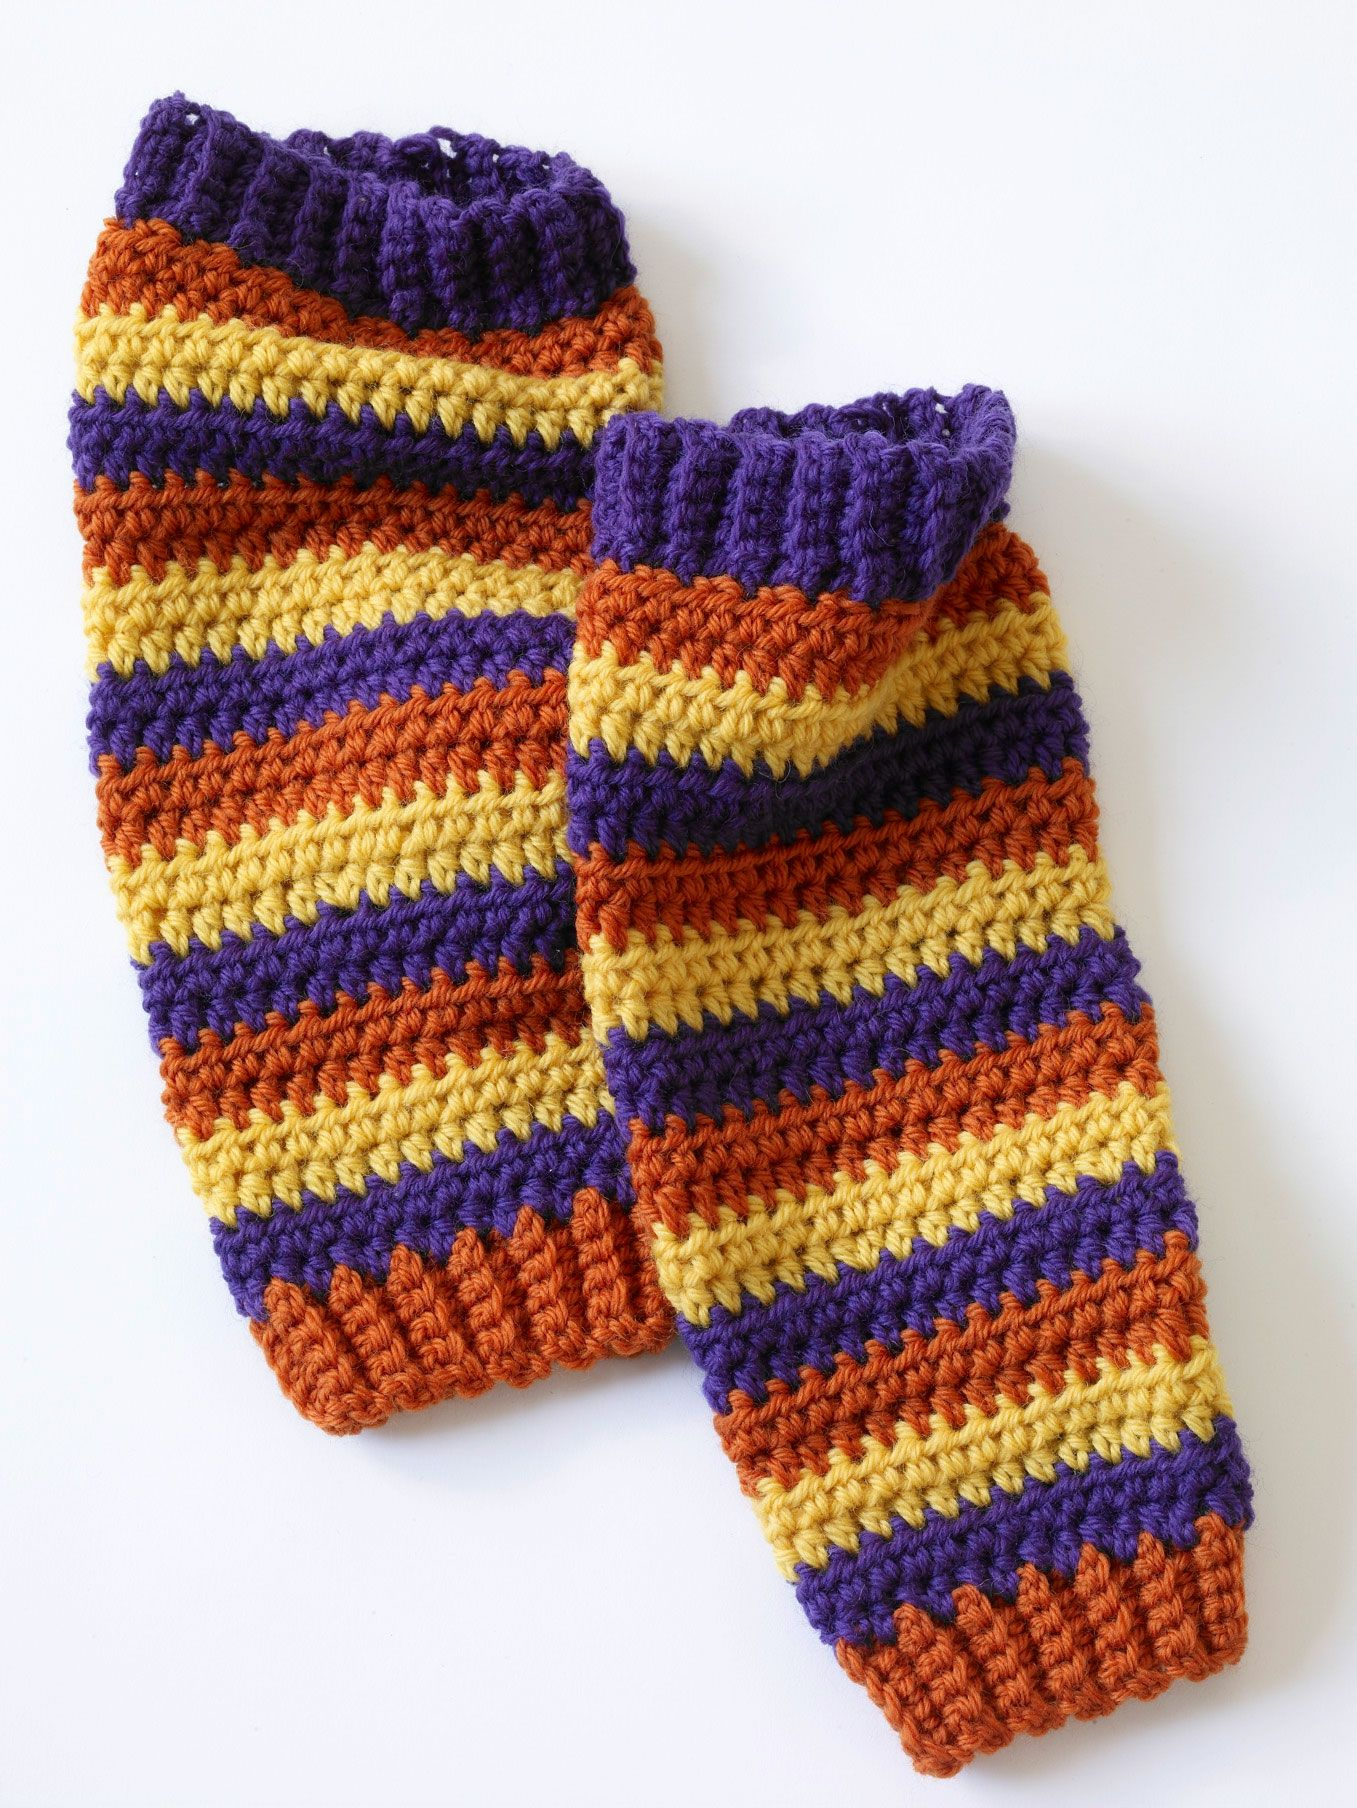 Freecrochetpatternlionbrand free crochet pattern 70440ad leg freecrochetpatternlionbrand free crochet pattern 70440ad leg warmers bankloansurffo Choice Image